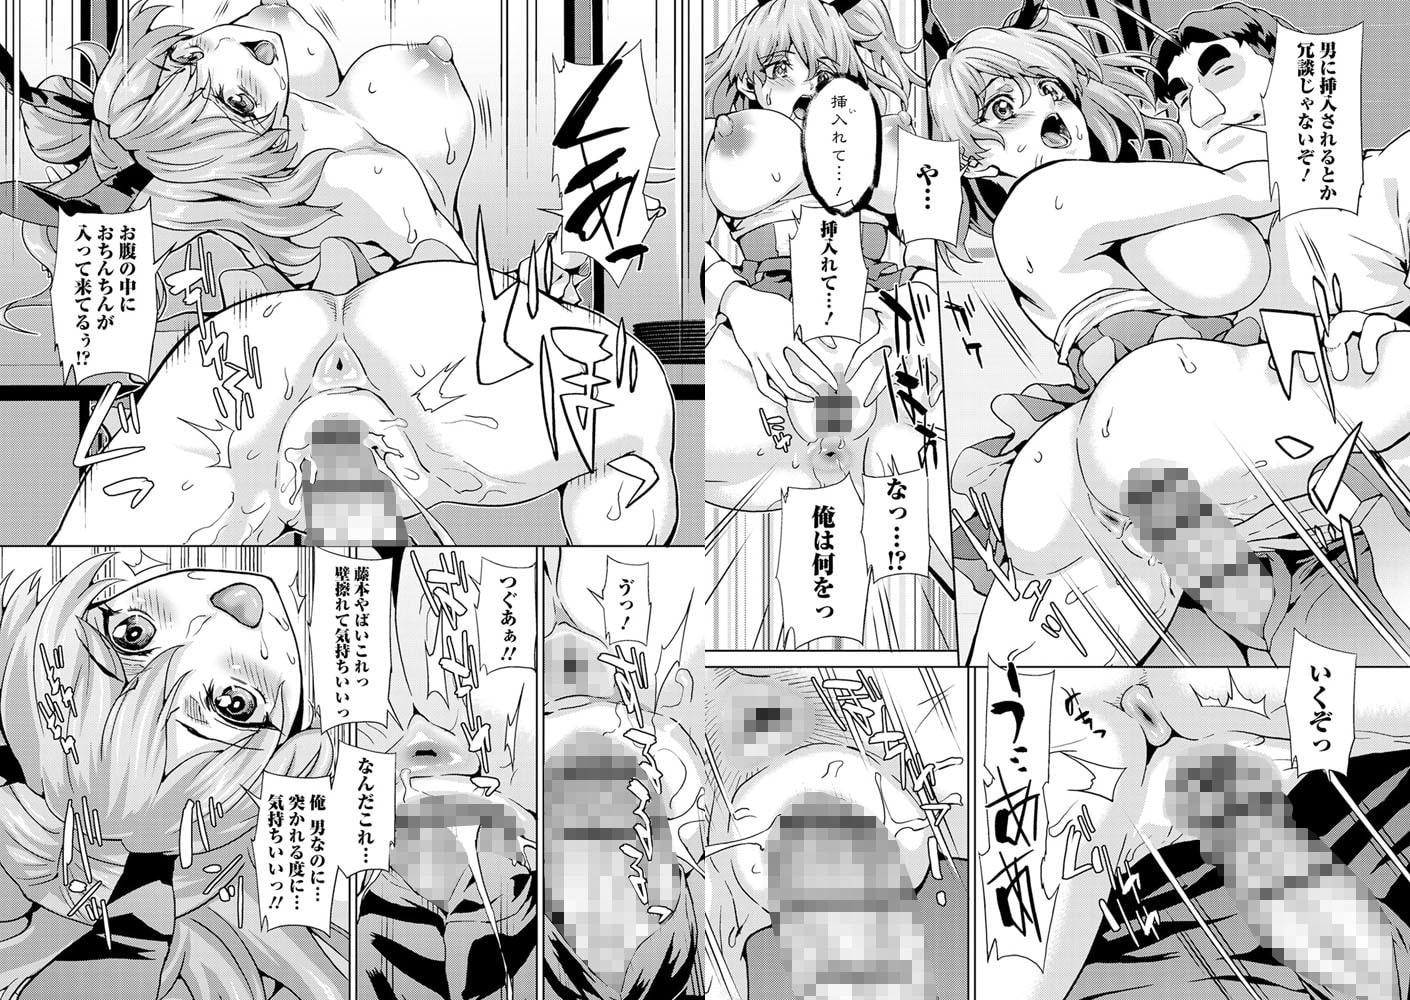 WEB版メスイキ!!にょたいか遊戯 Vol.04